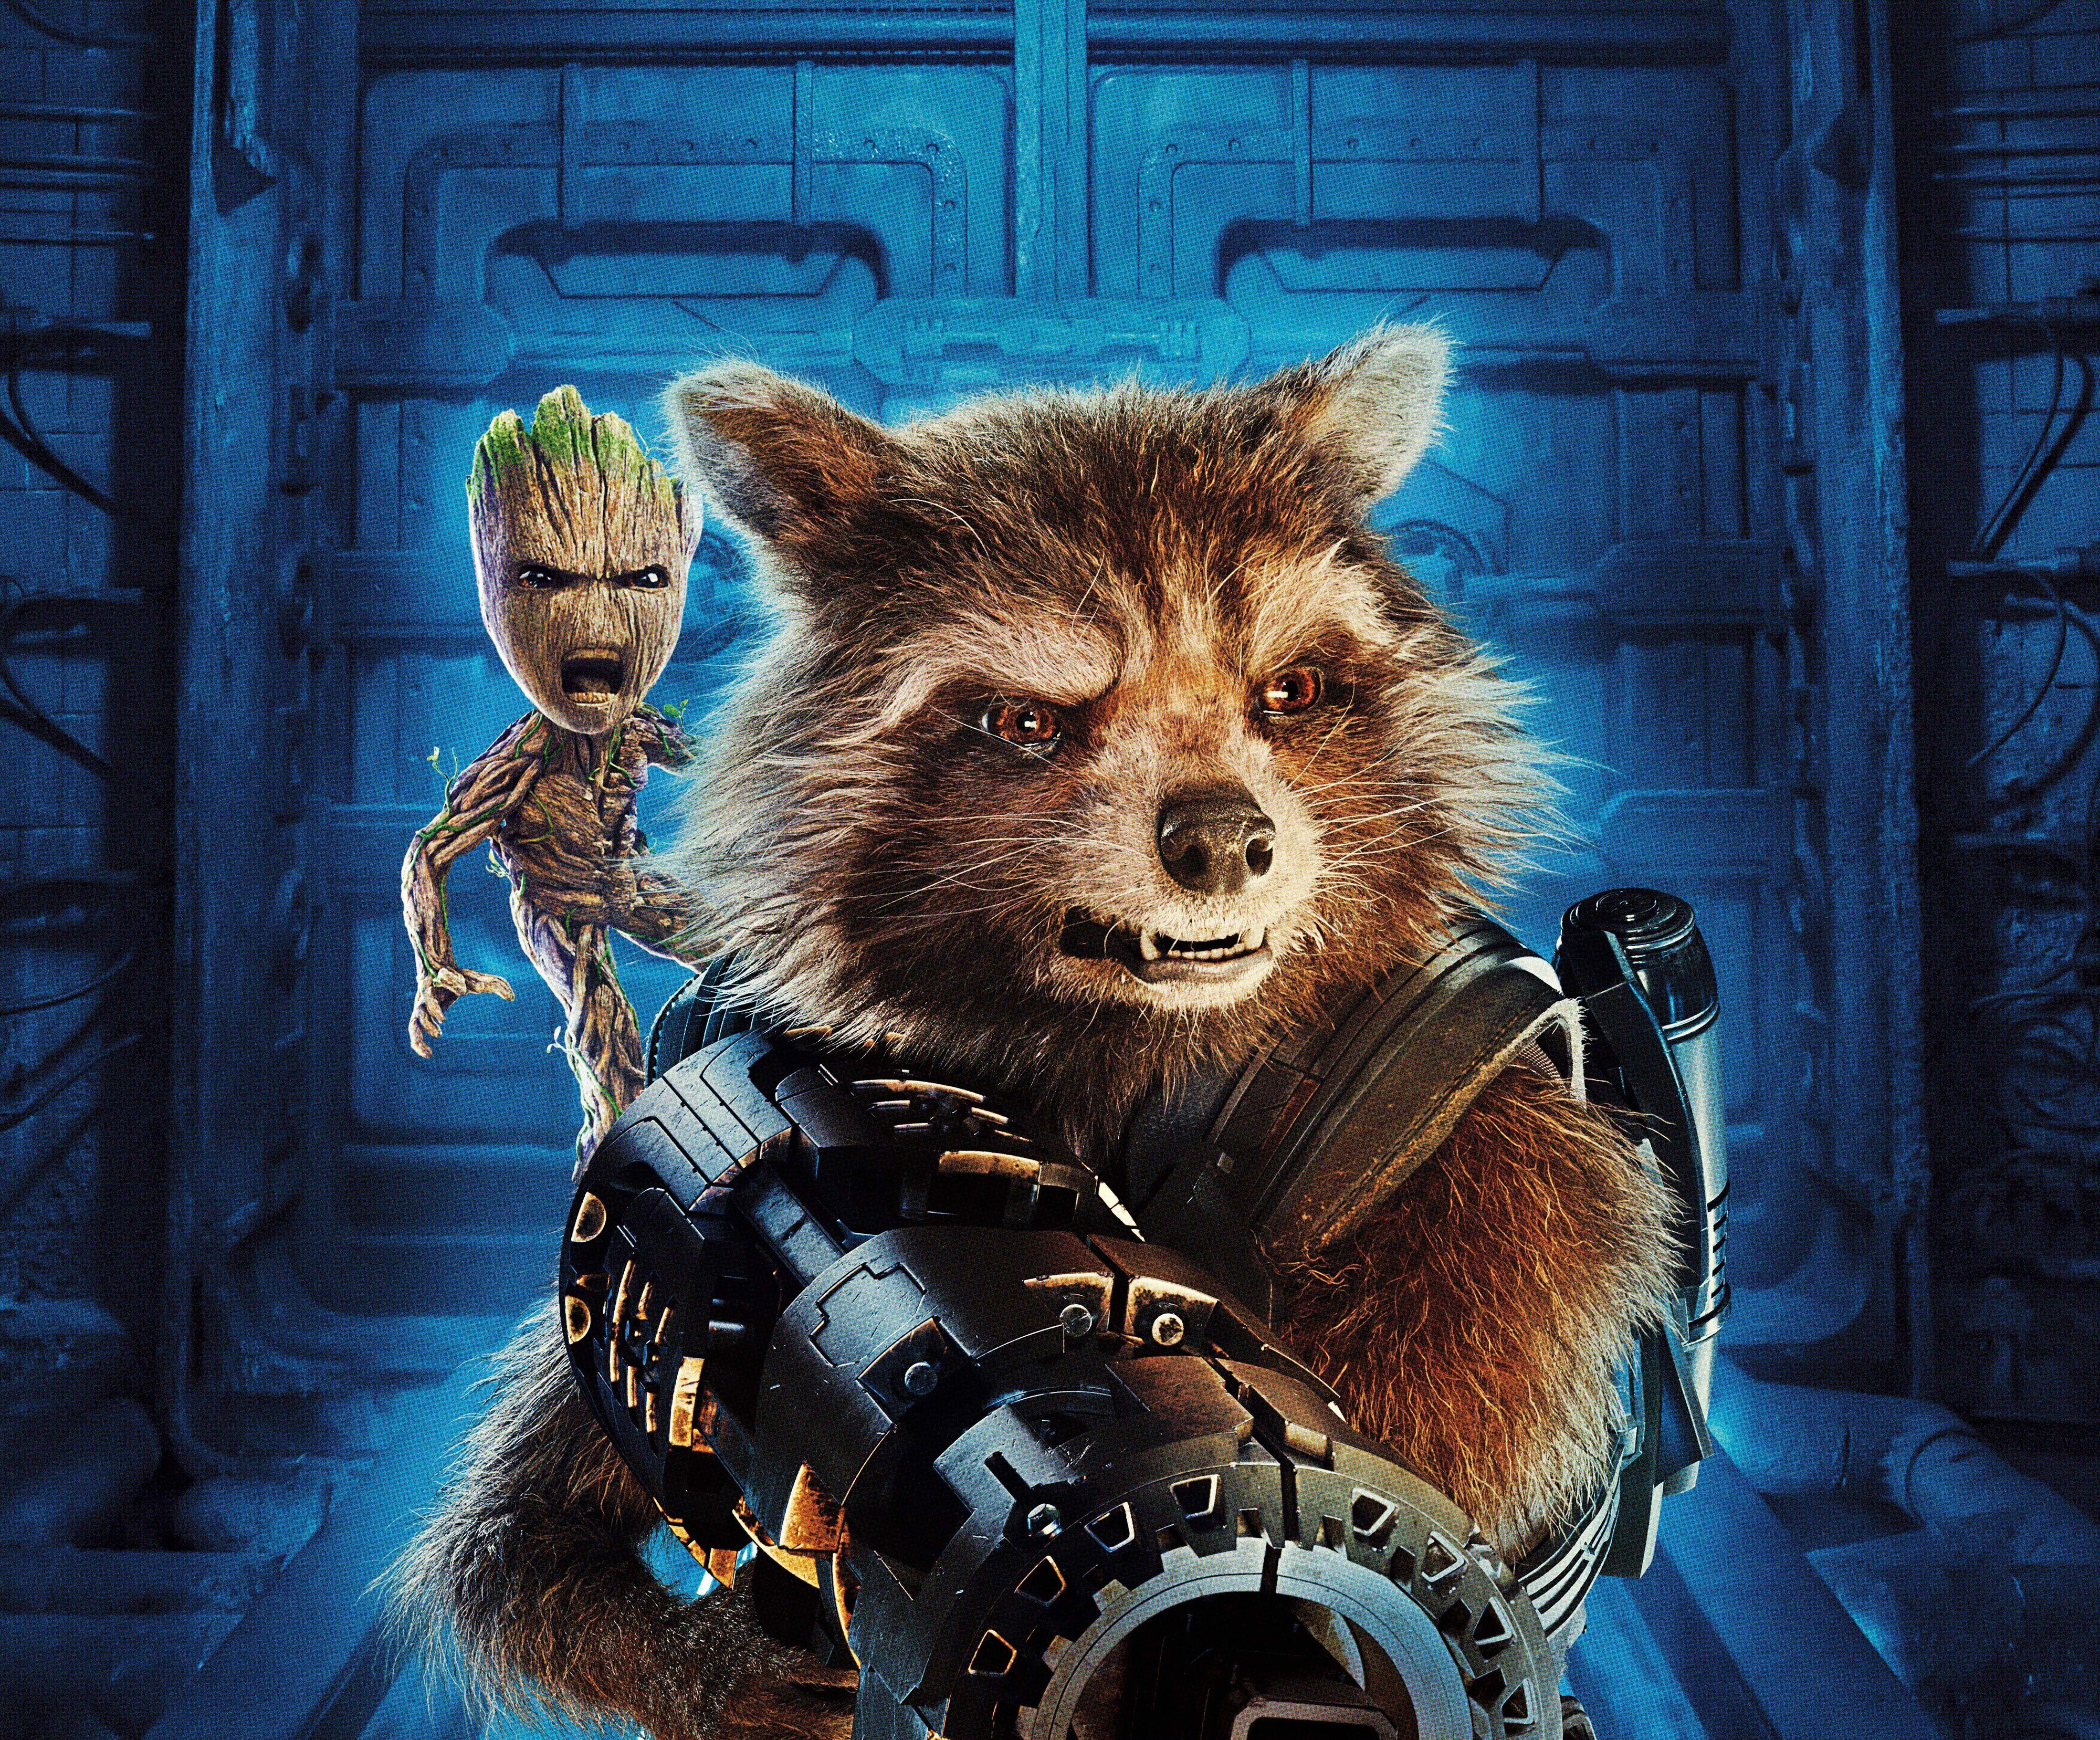 Ide Galaxy Wallpaper Terbaik Di Pinterest Carina Nebula Baby Groot Guardians Of The Galaxy Groot